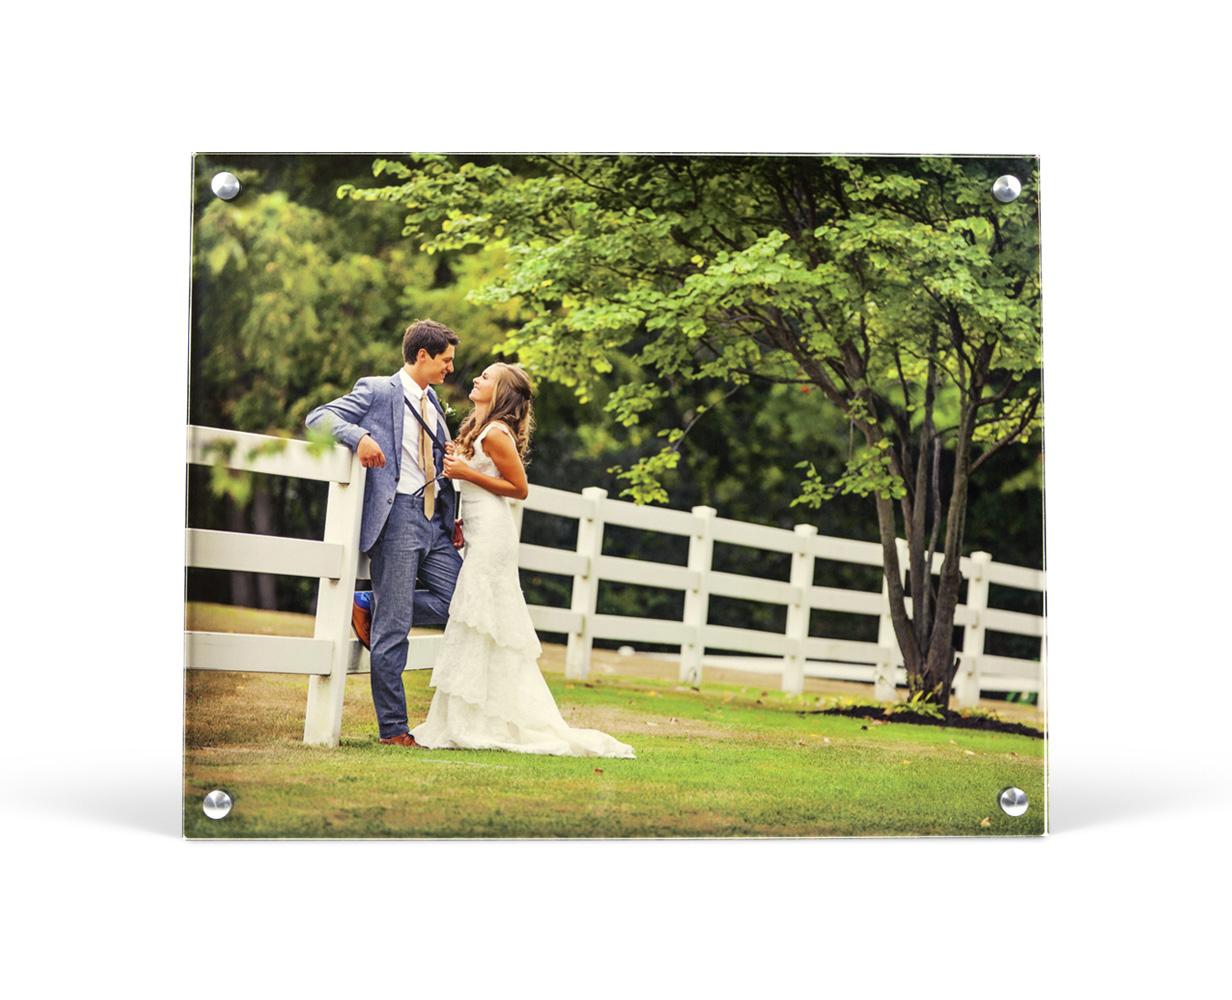 h_metal_acrylicposts_wedding.jpg